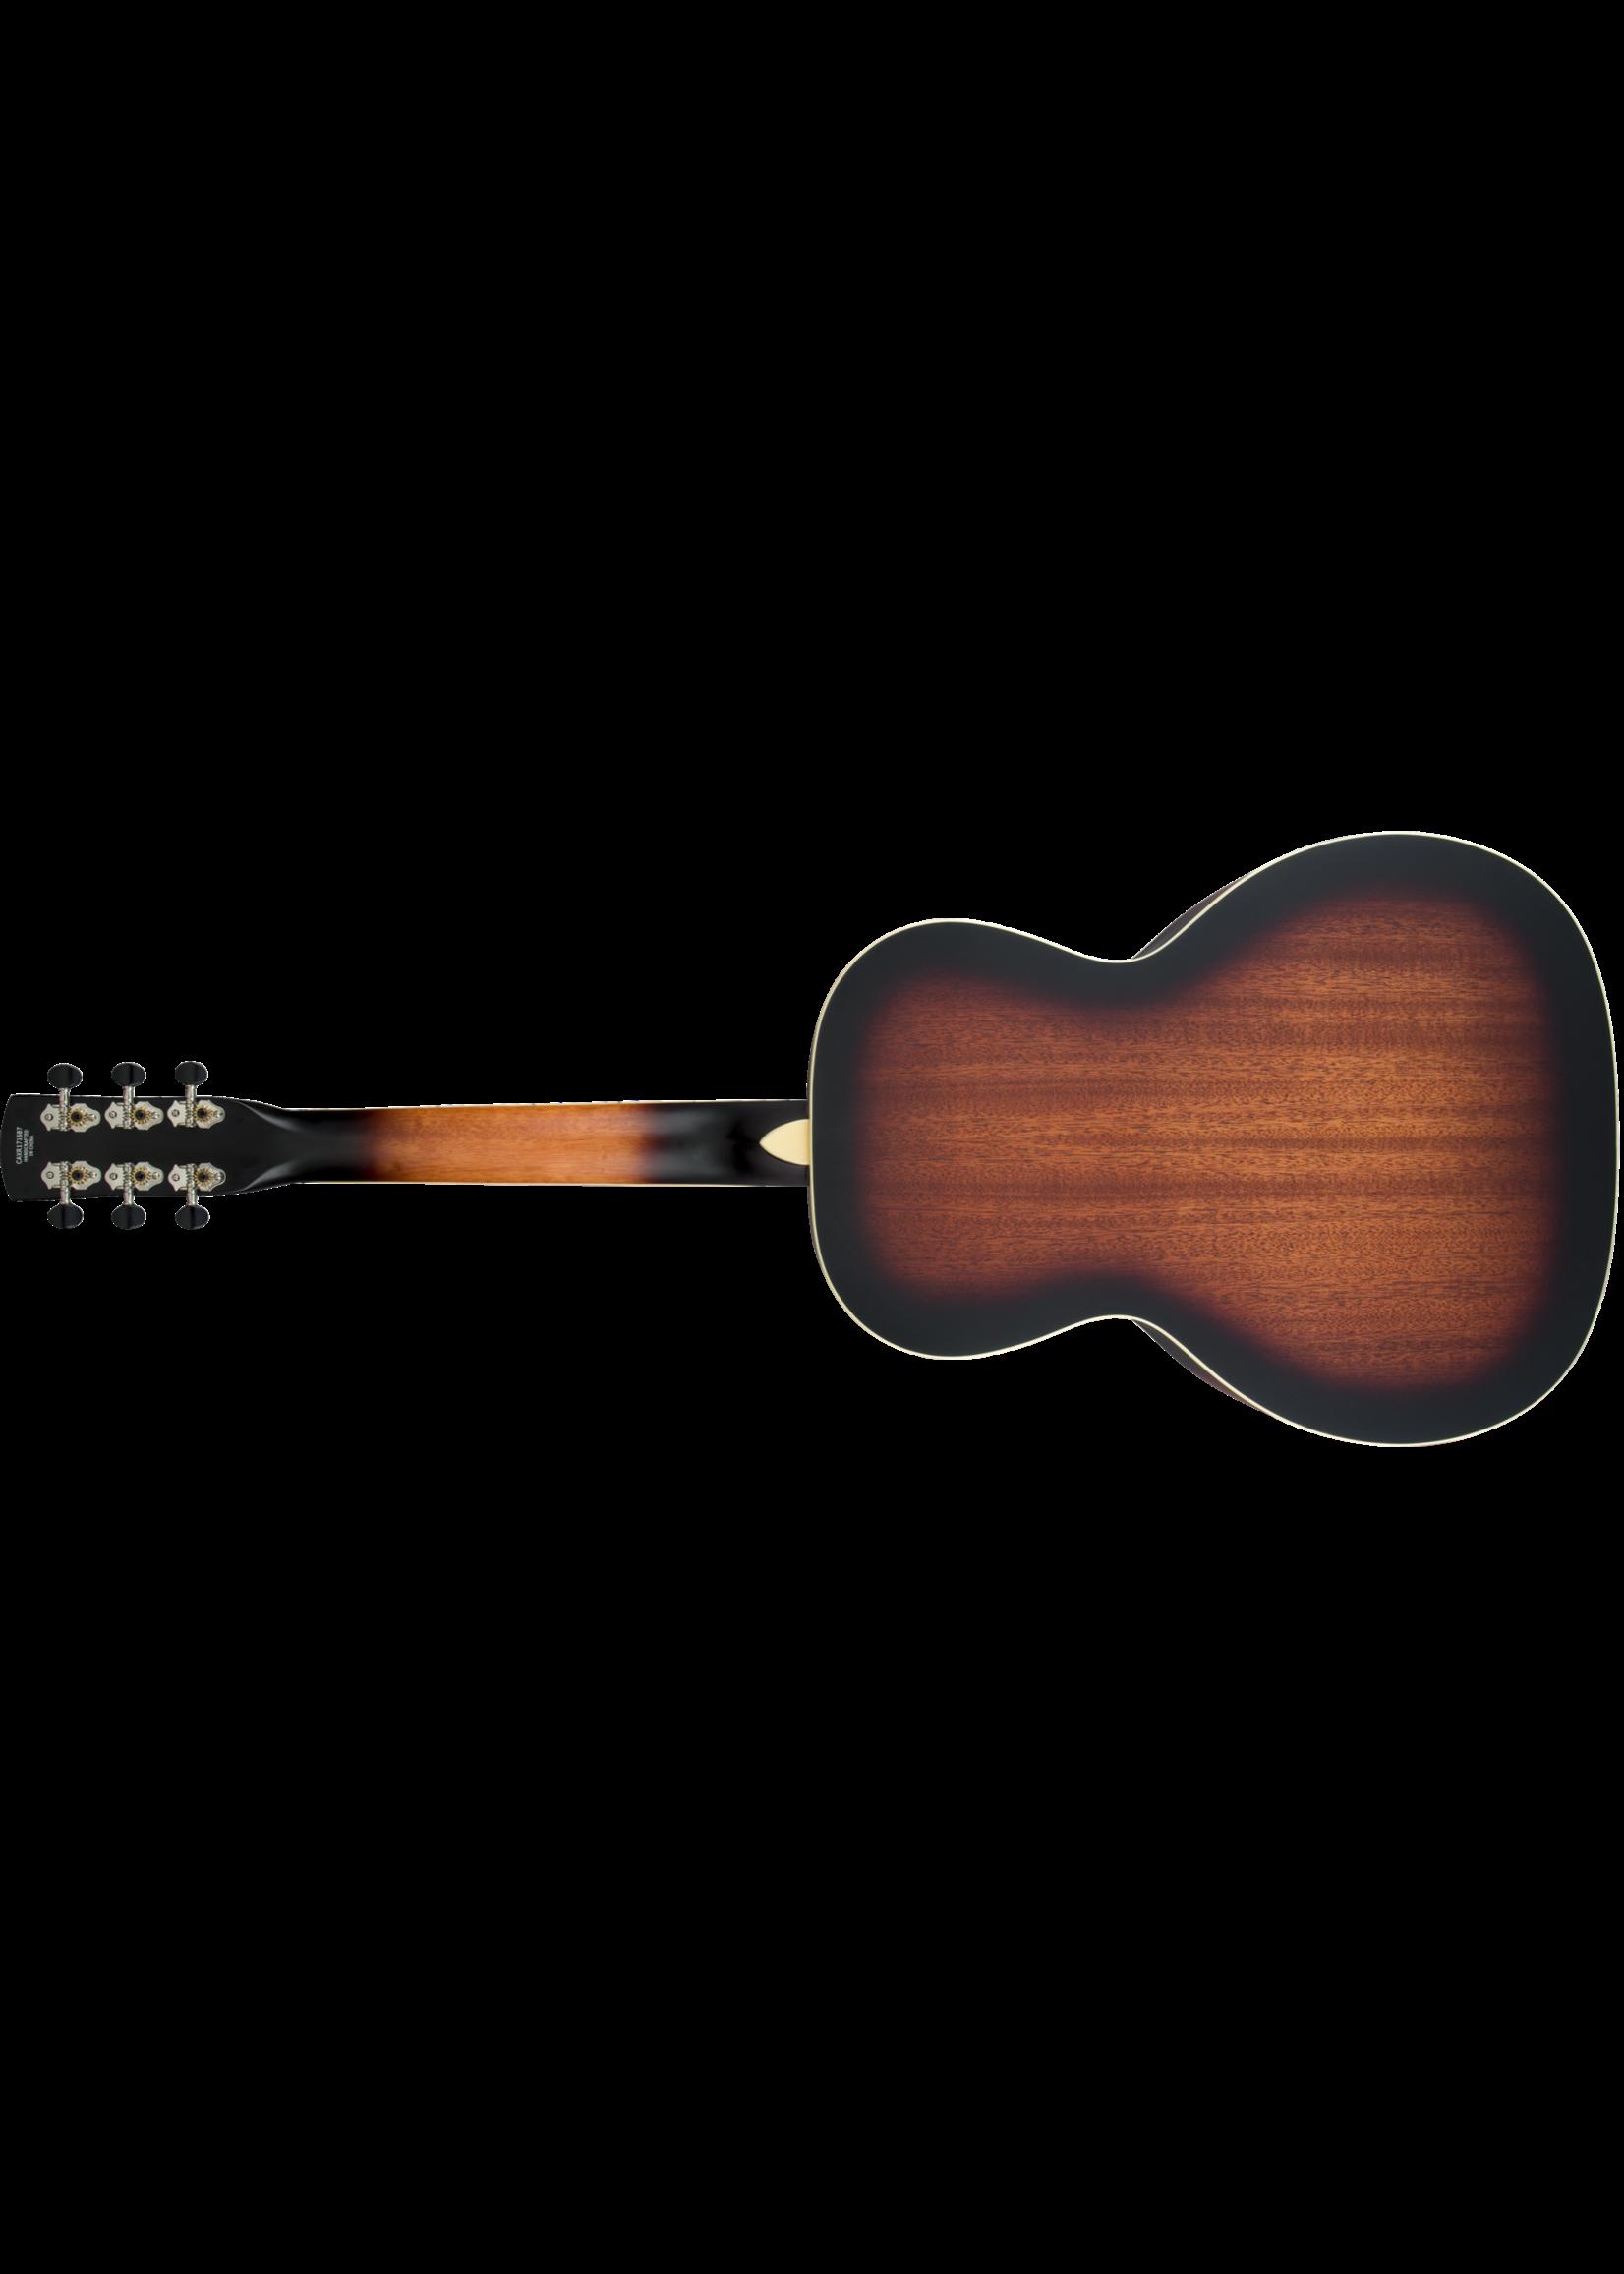 Gretsch Gretsch G9220 Bobtail Round-Neck Acoustic-Electric Resonator Guitar